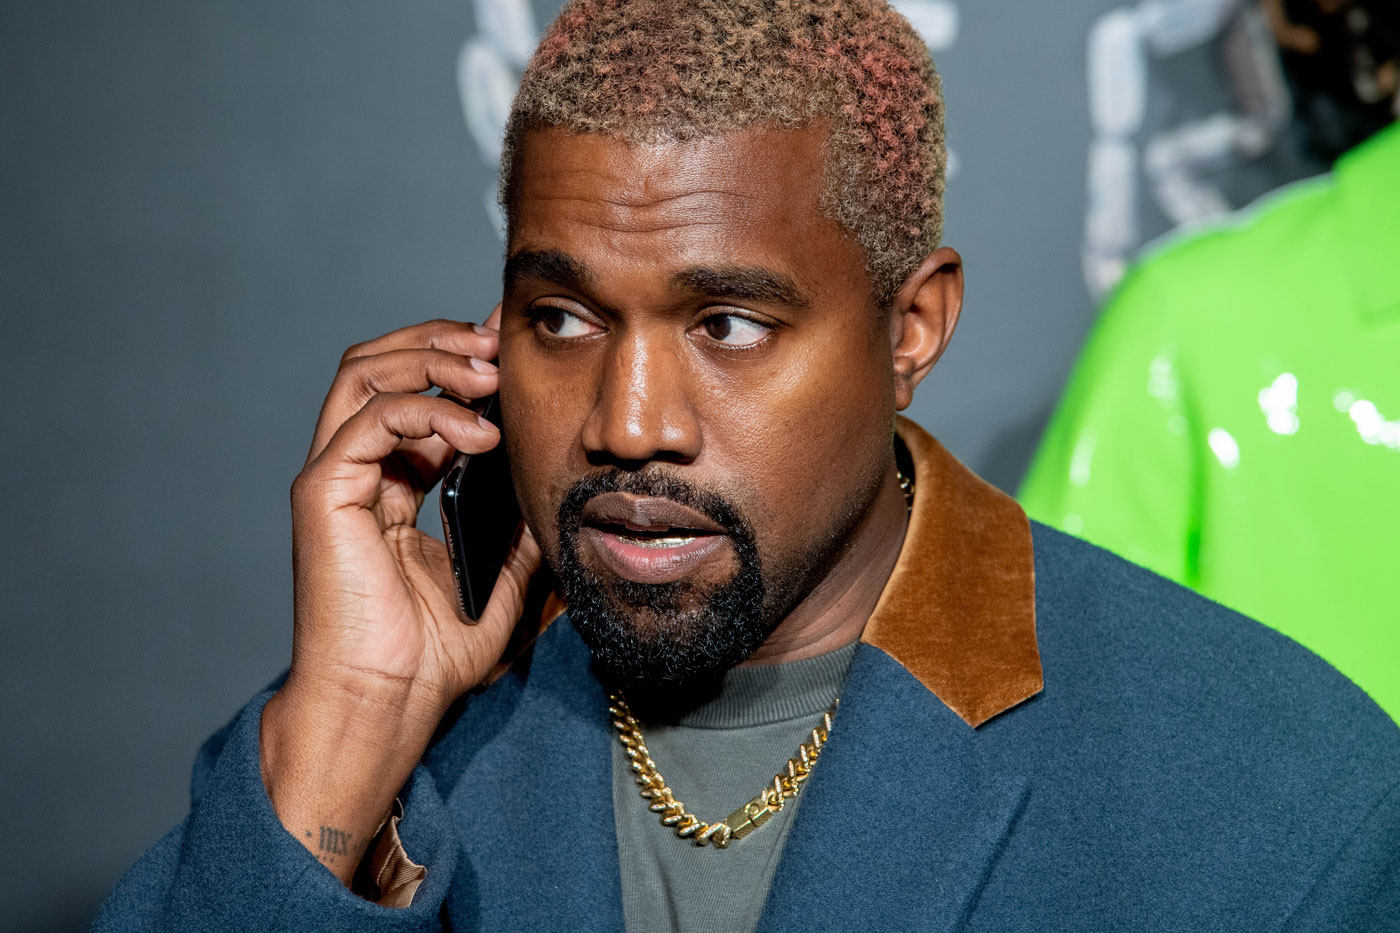 战况白热化!Kanye West 公开与 Drake 私下争吵细节